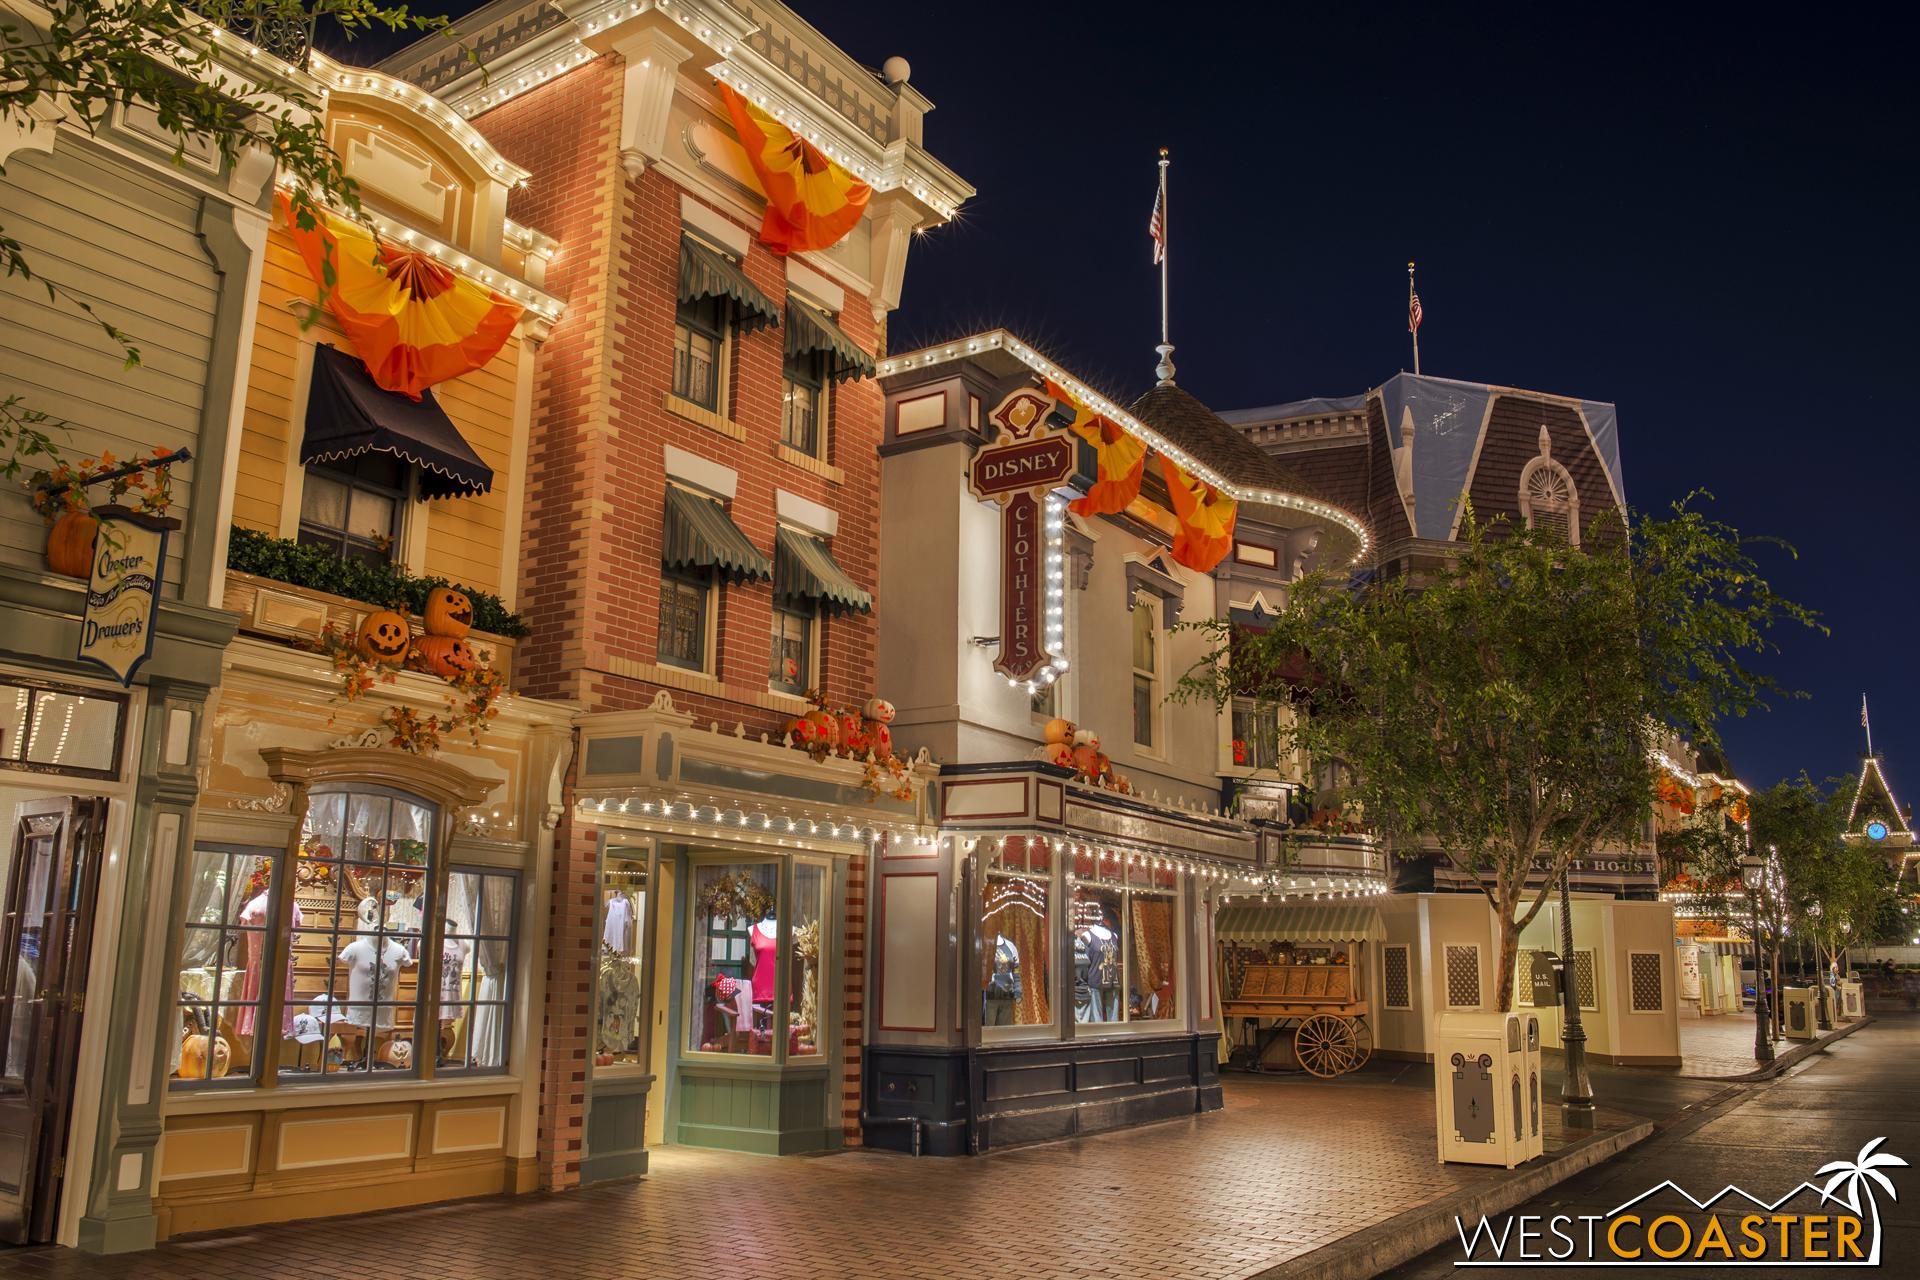 Disney Clothiers, with under-exterior-refurbishment Market House beyond.